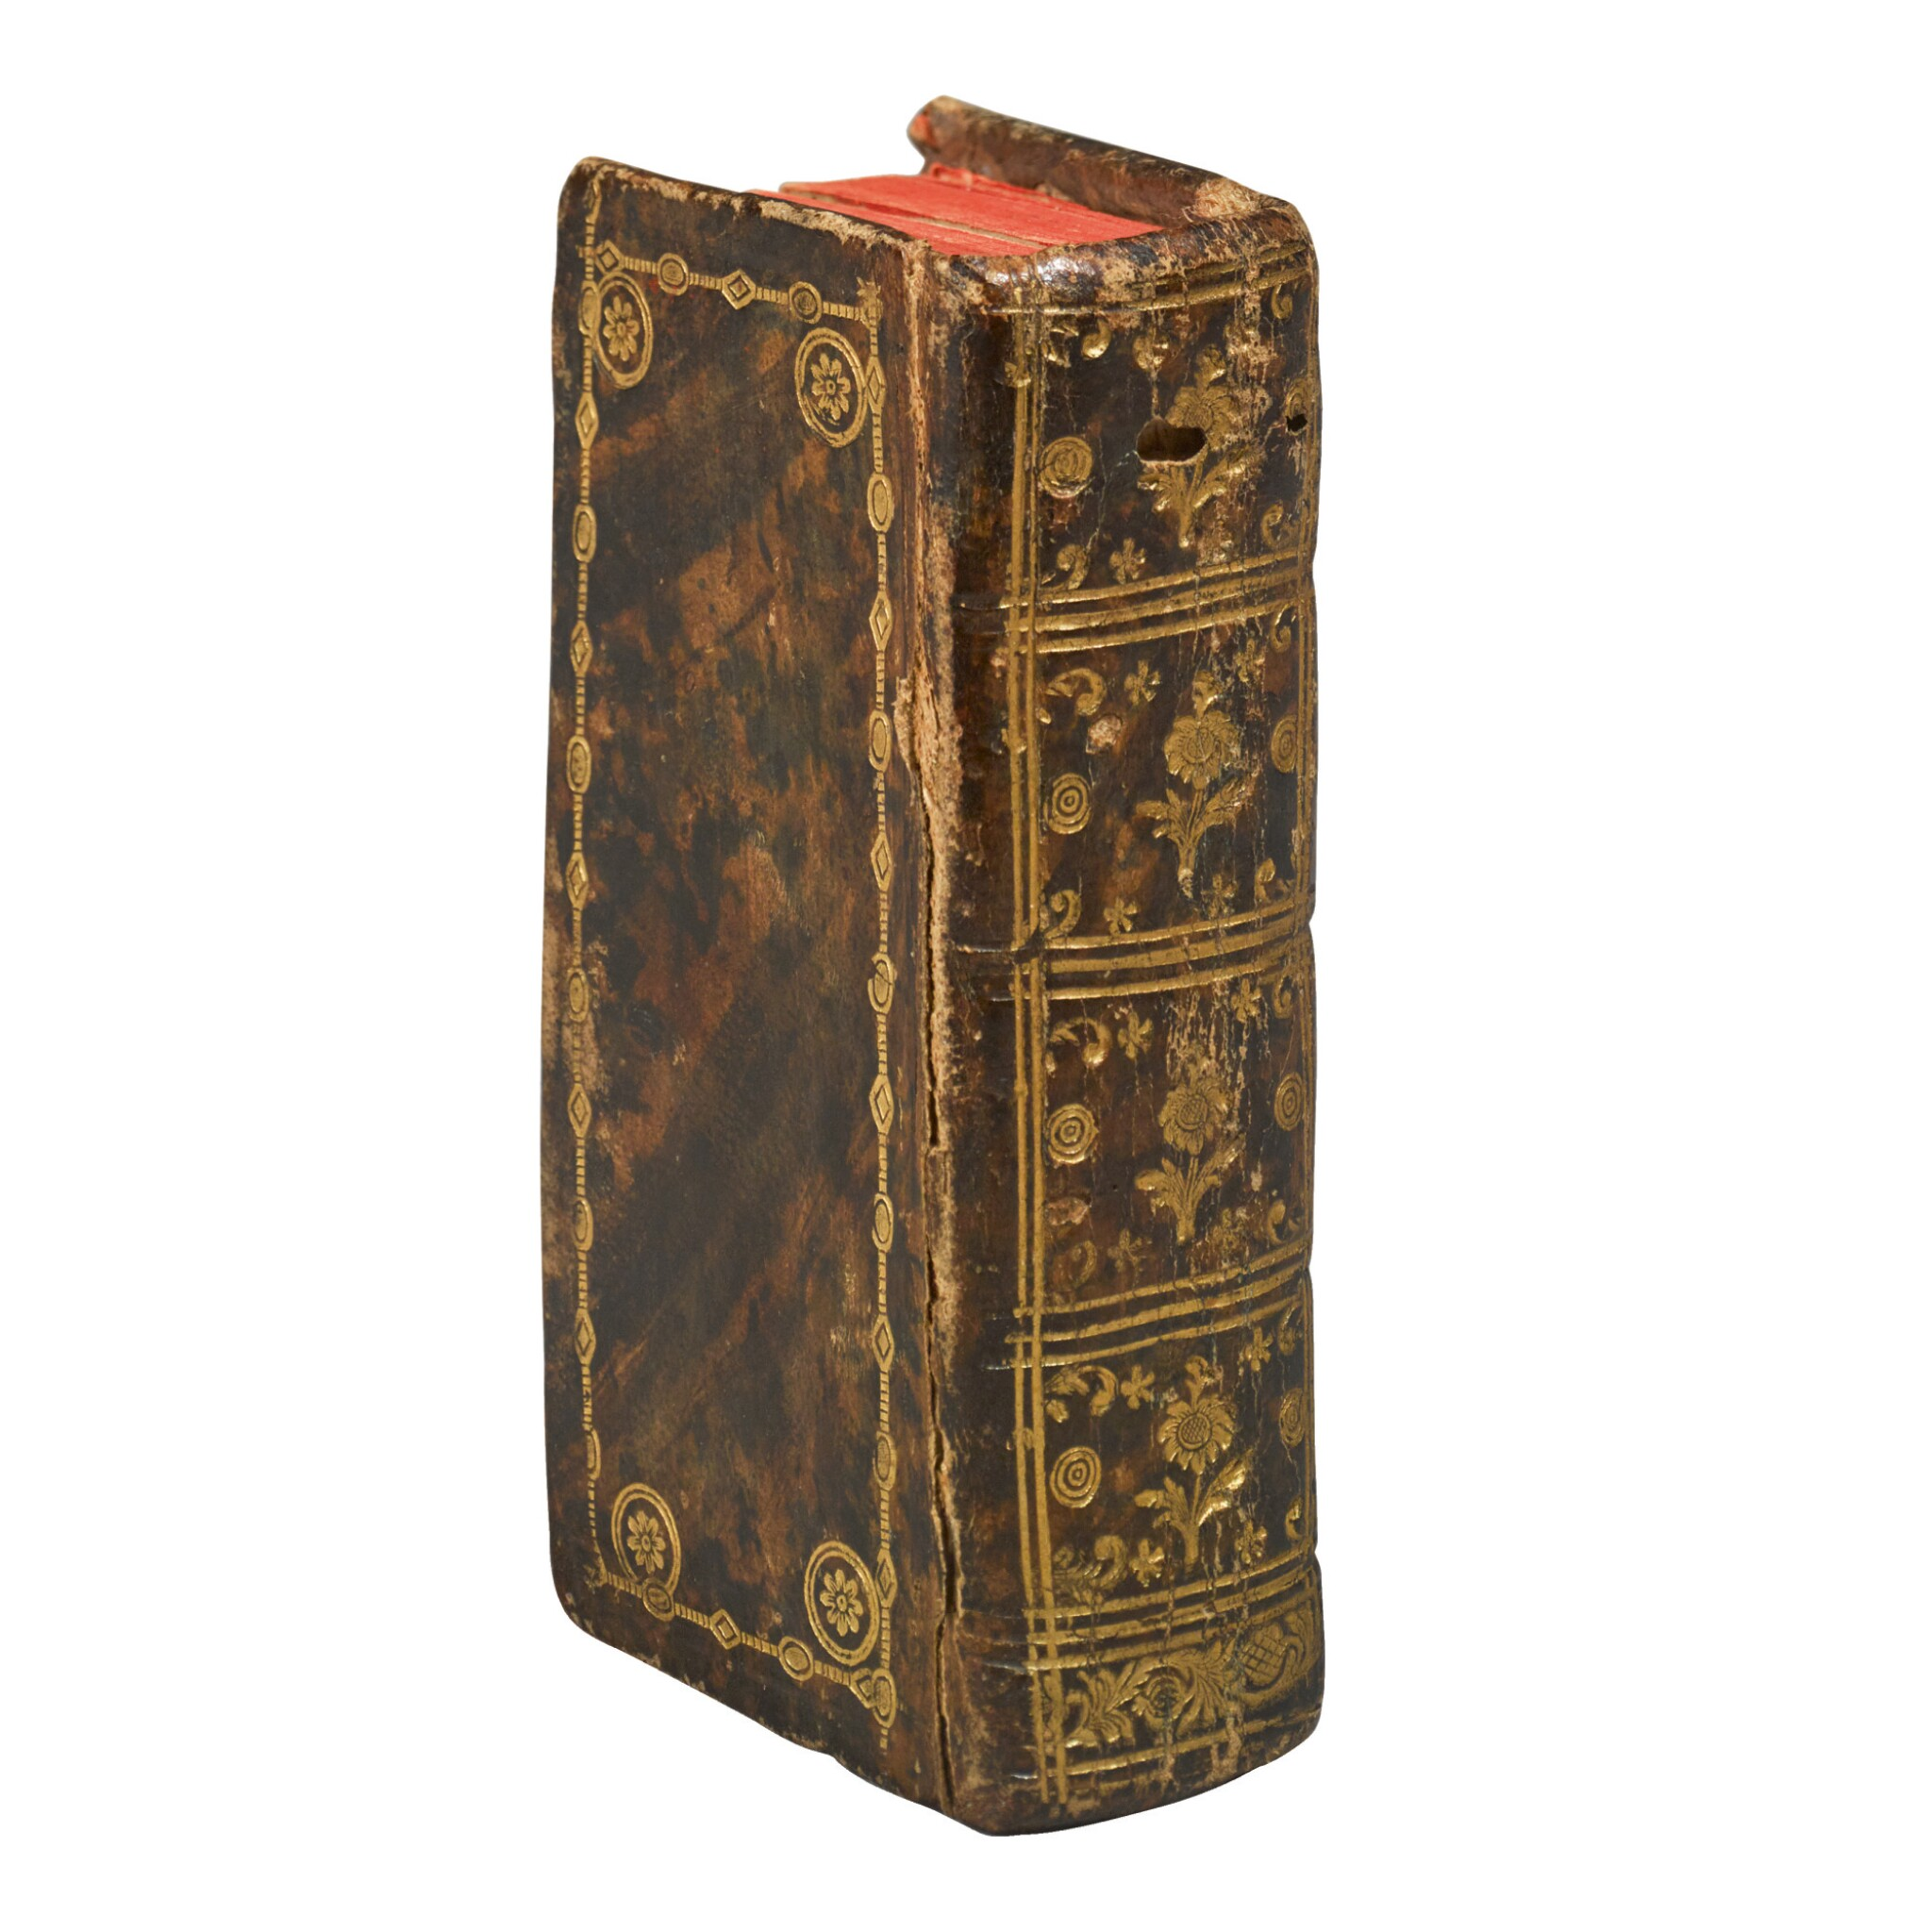 PENTATEUCH, FIVE SCROLLS, AND HAFTAROT, VENICE: GIOVANNI DI GARA, 1588-1589